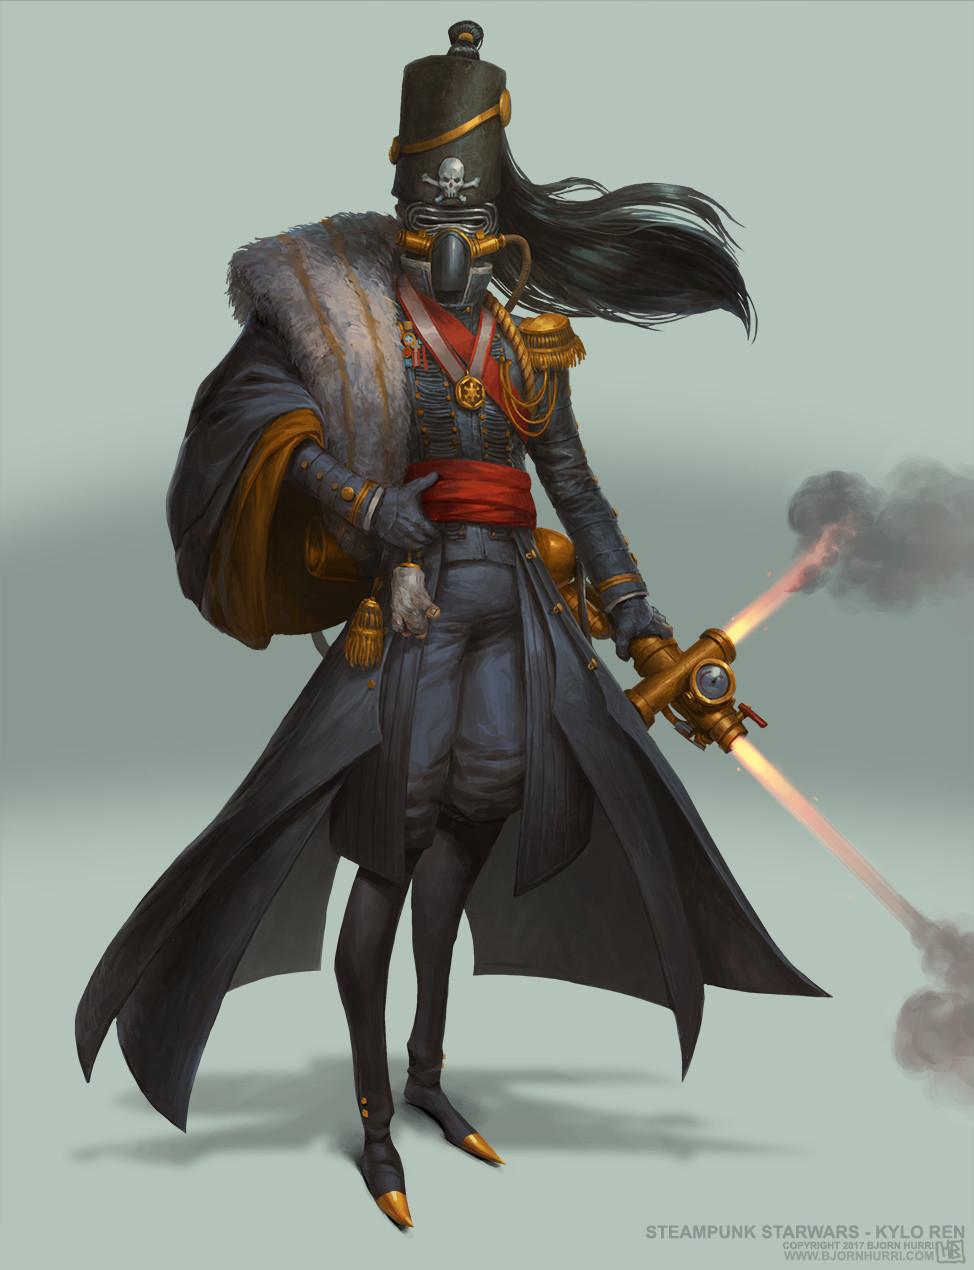 Steampunk Character Concept Art